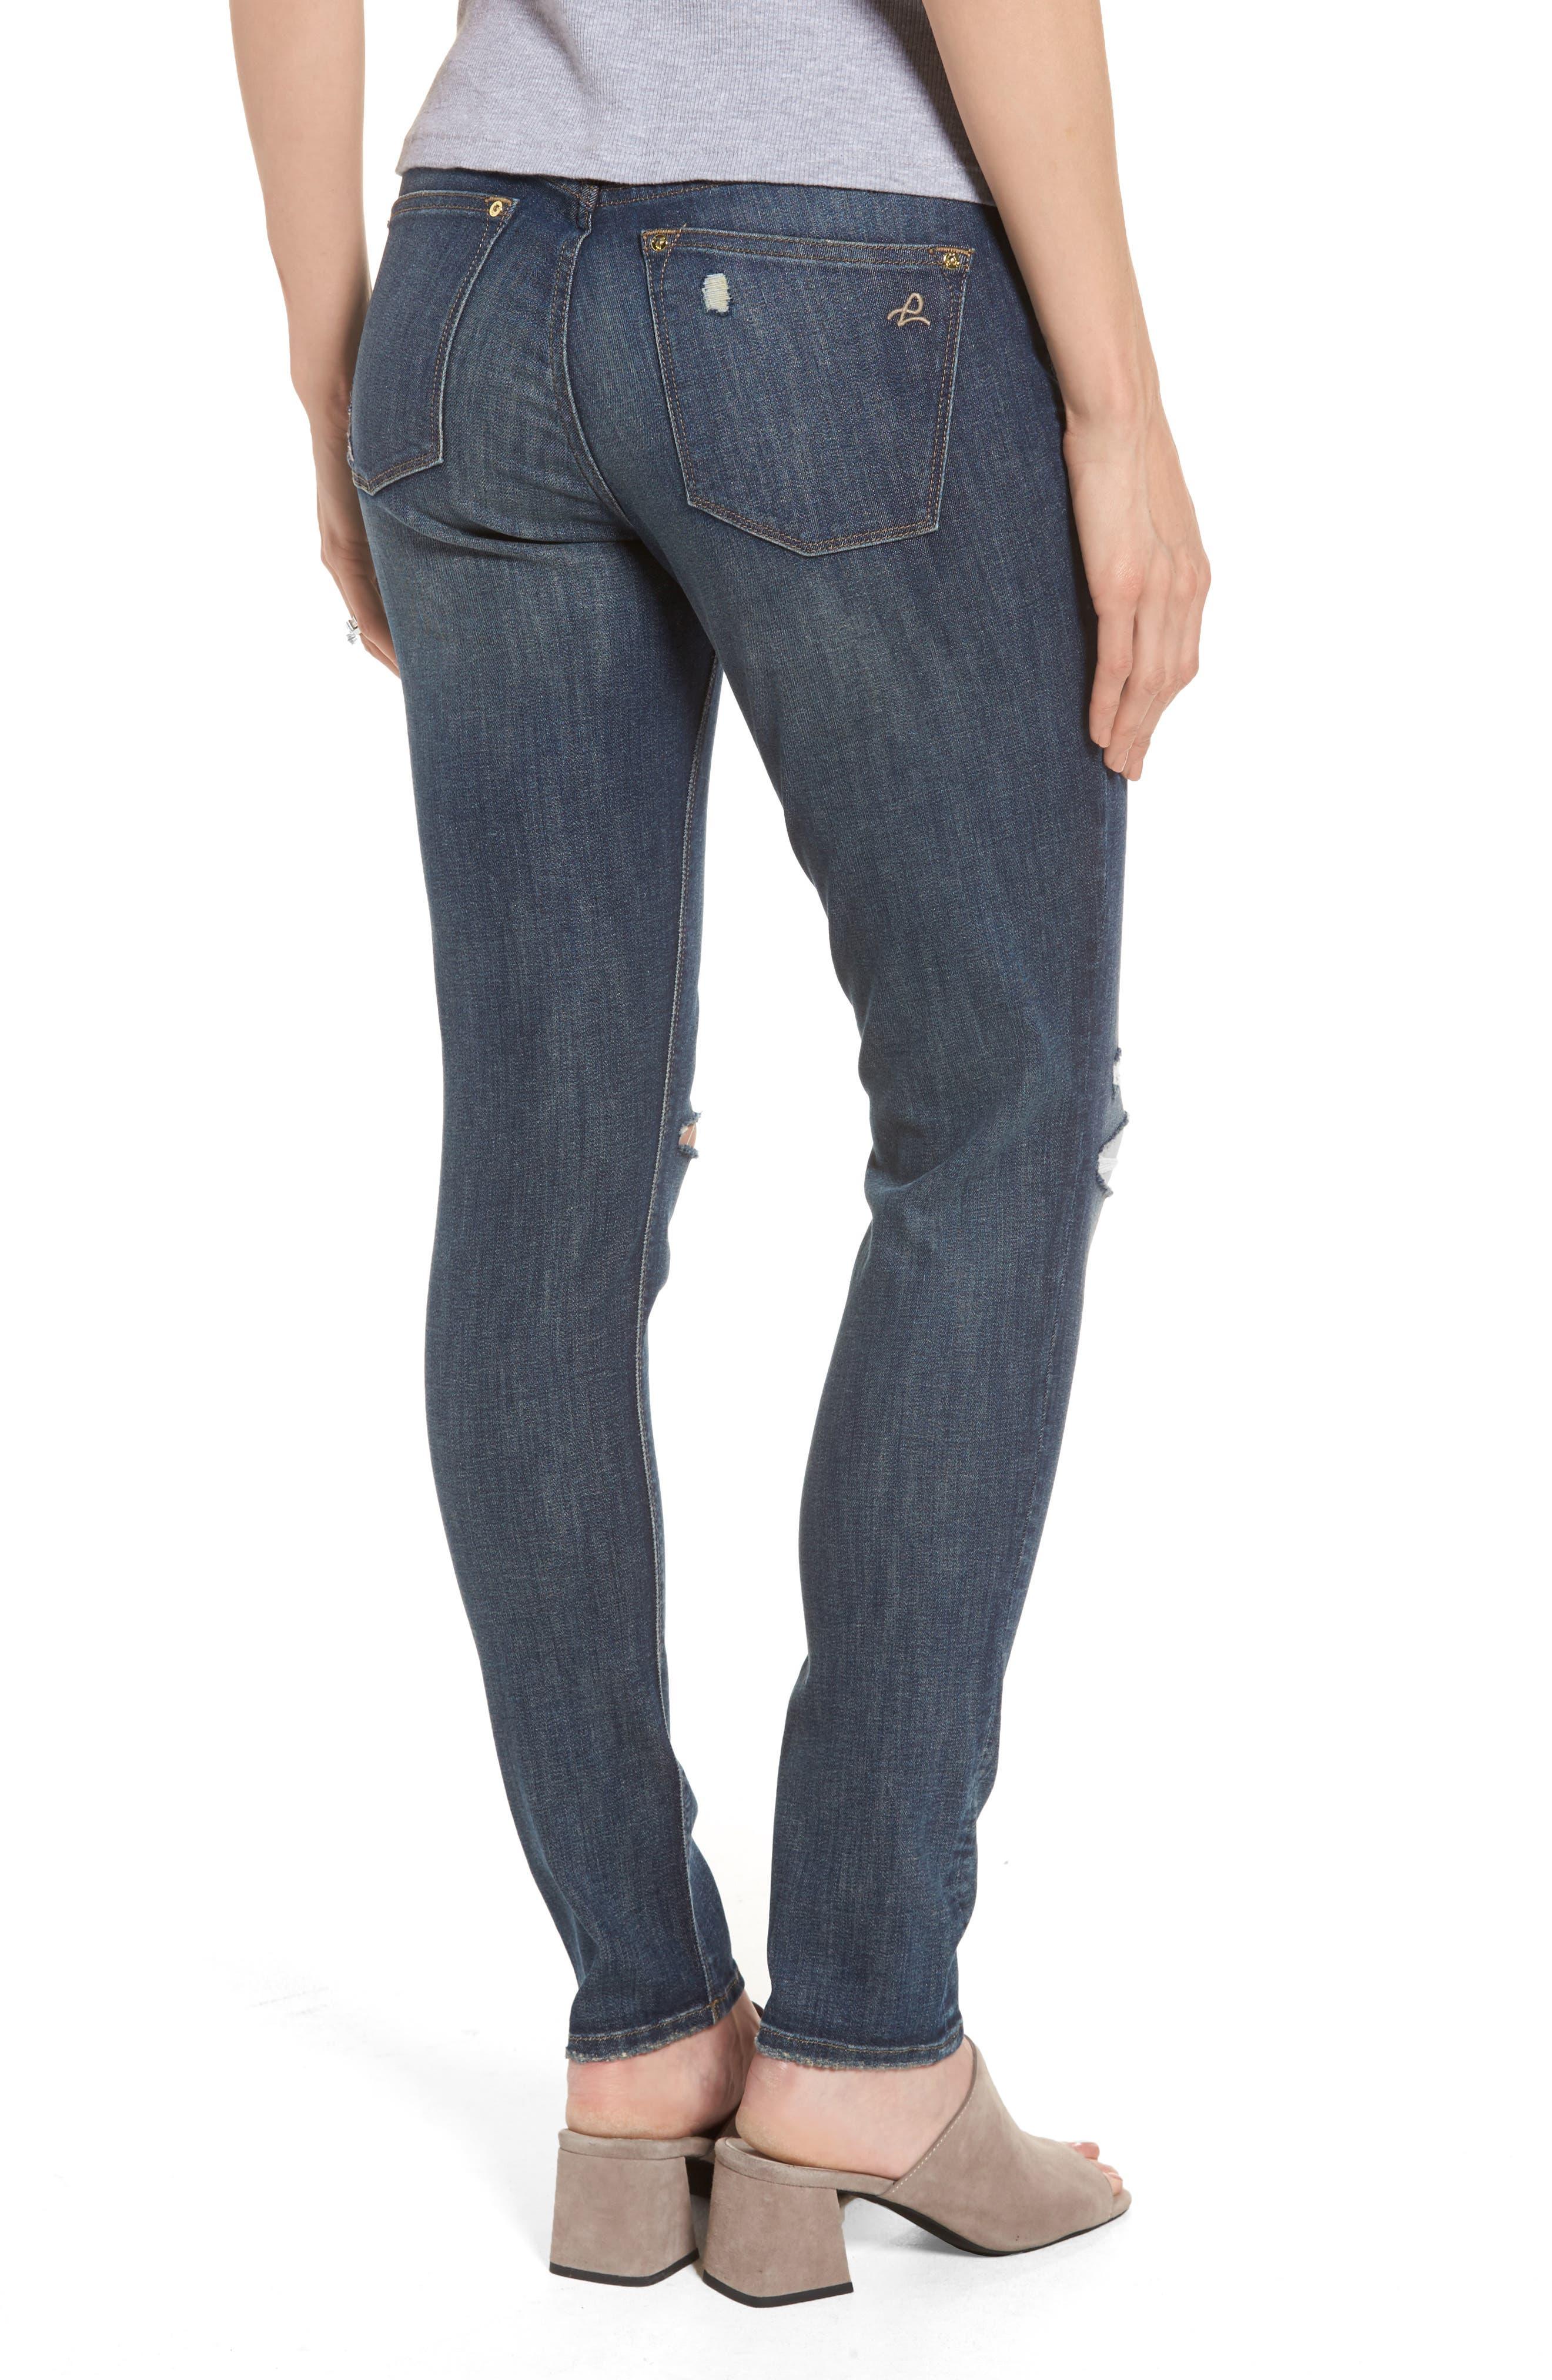 Emma Power Legging Maternity Jeans,                             Alternate thumbnail 2, color,                             405